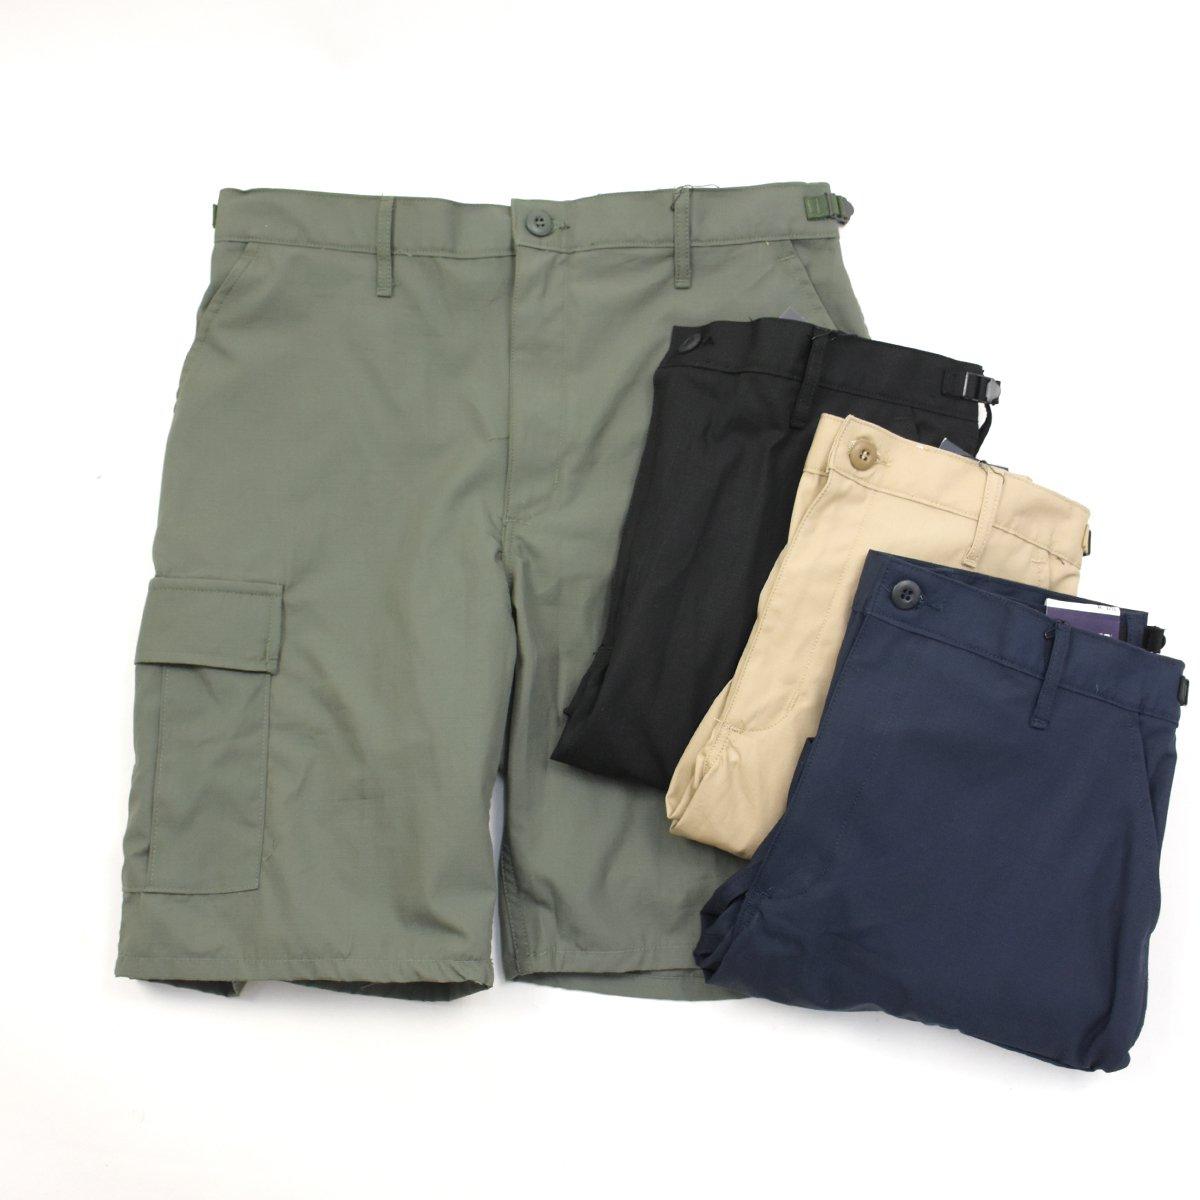 【PROPPER】Ripstop BDU Shorts  (5Color)                           </a>             <span class=